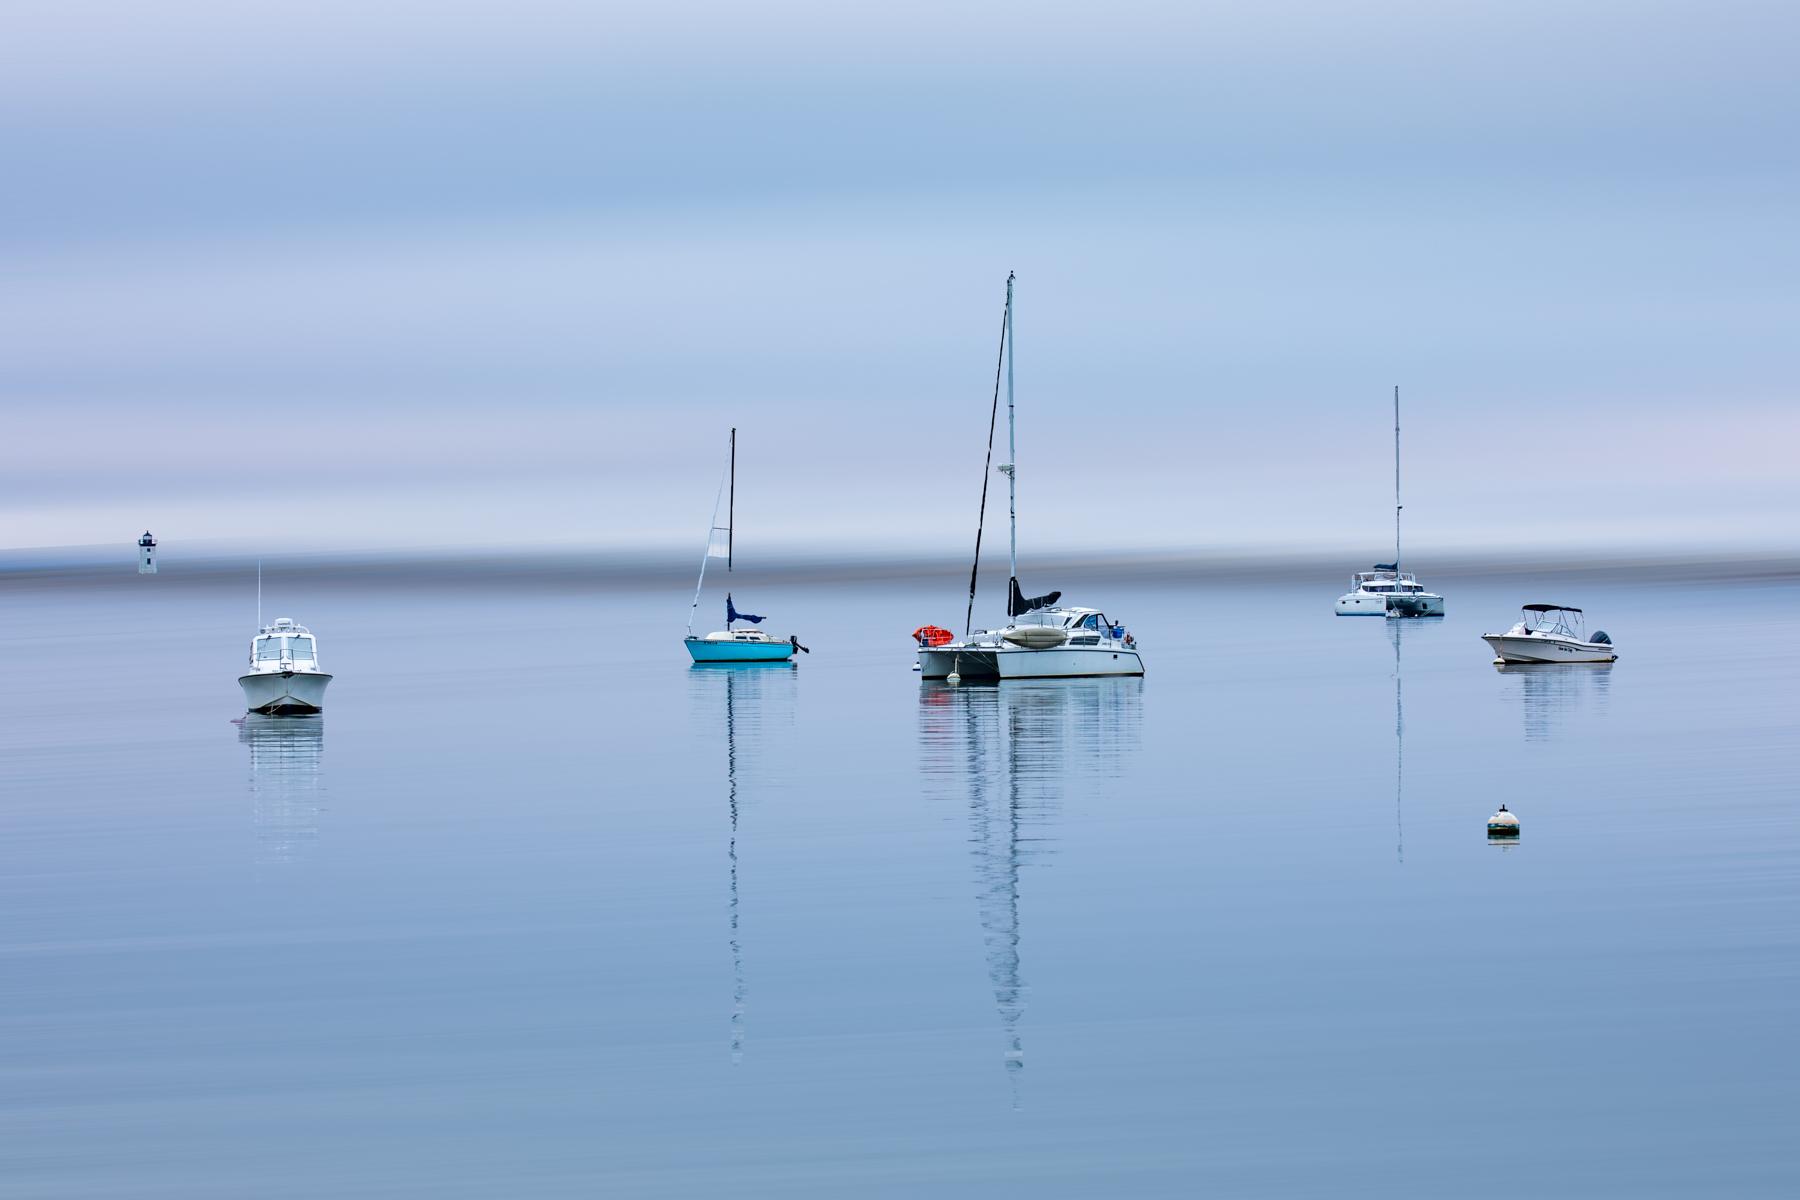 Boats & Lighthouse blur Provincetown, Cape Cod, USA